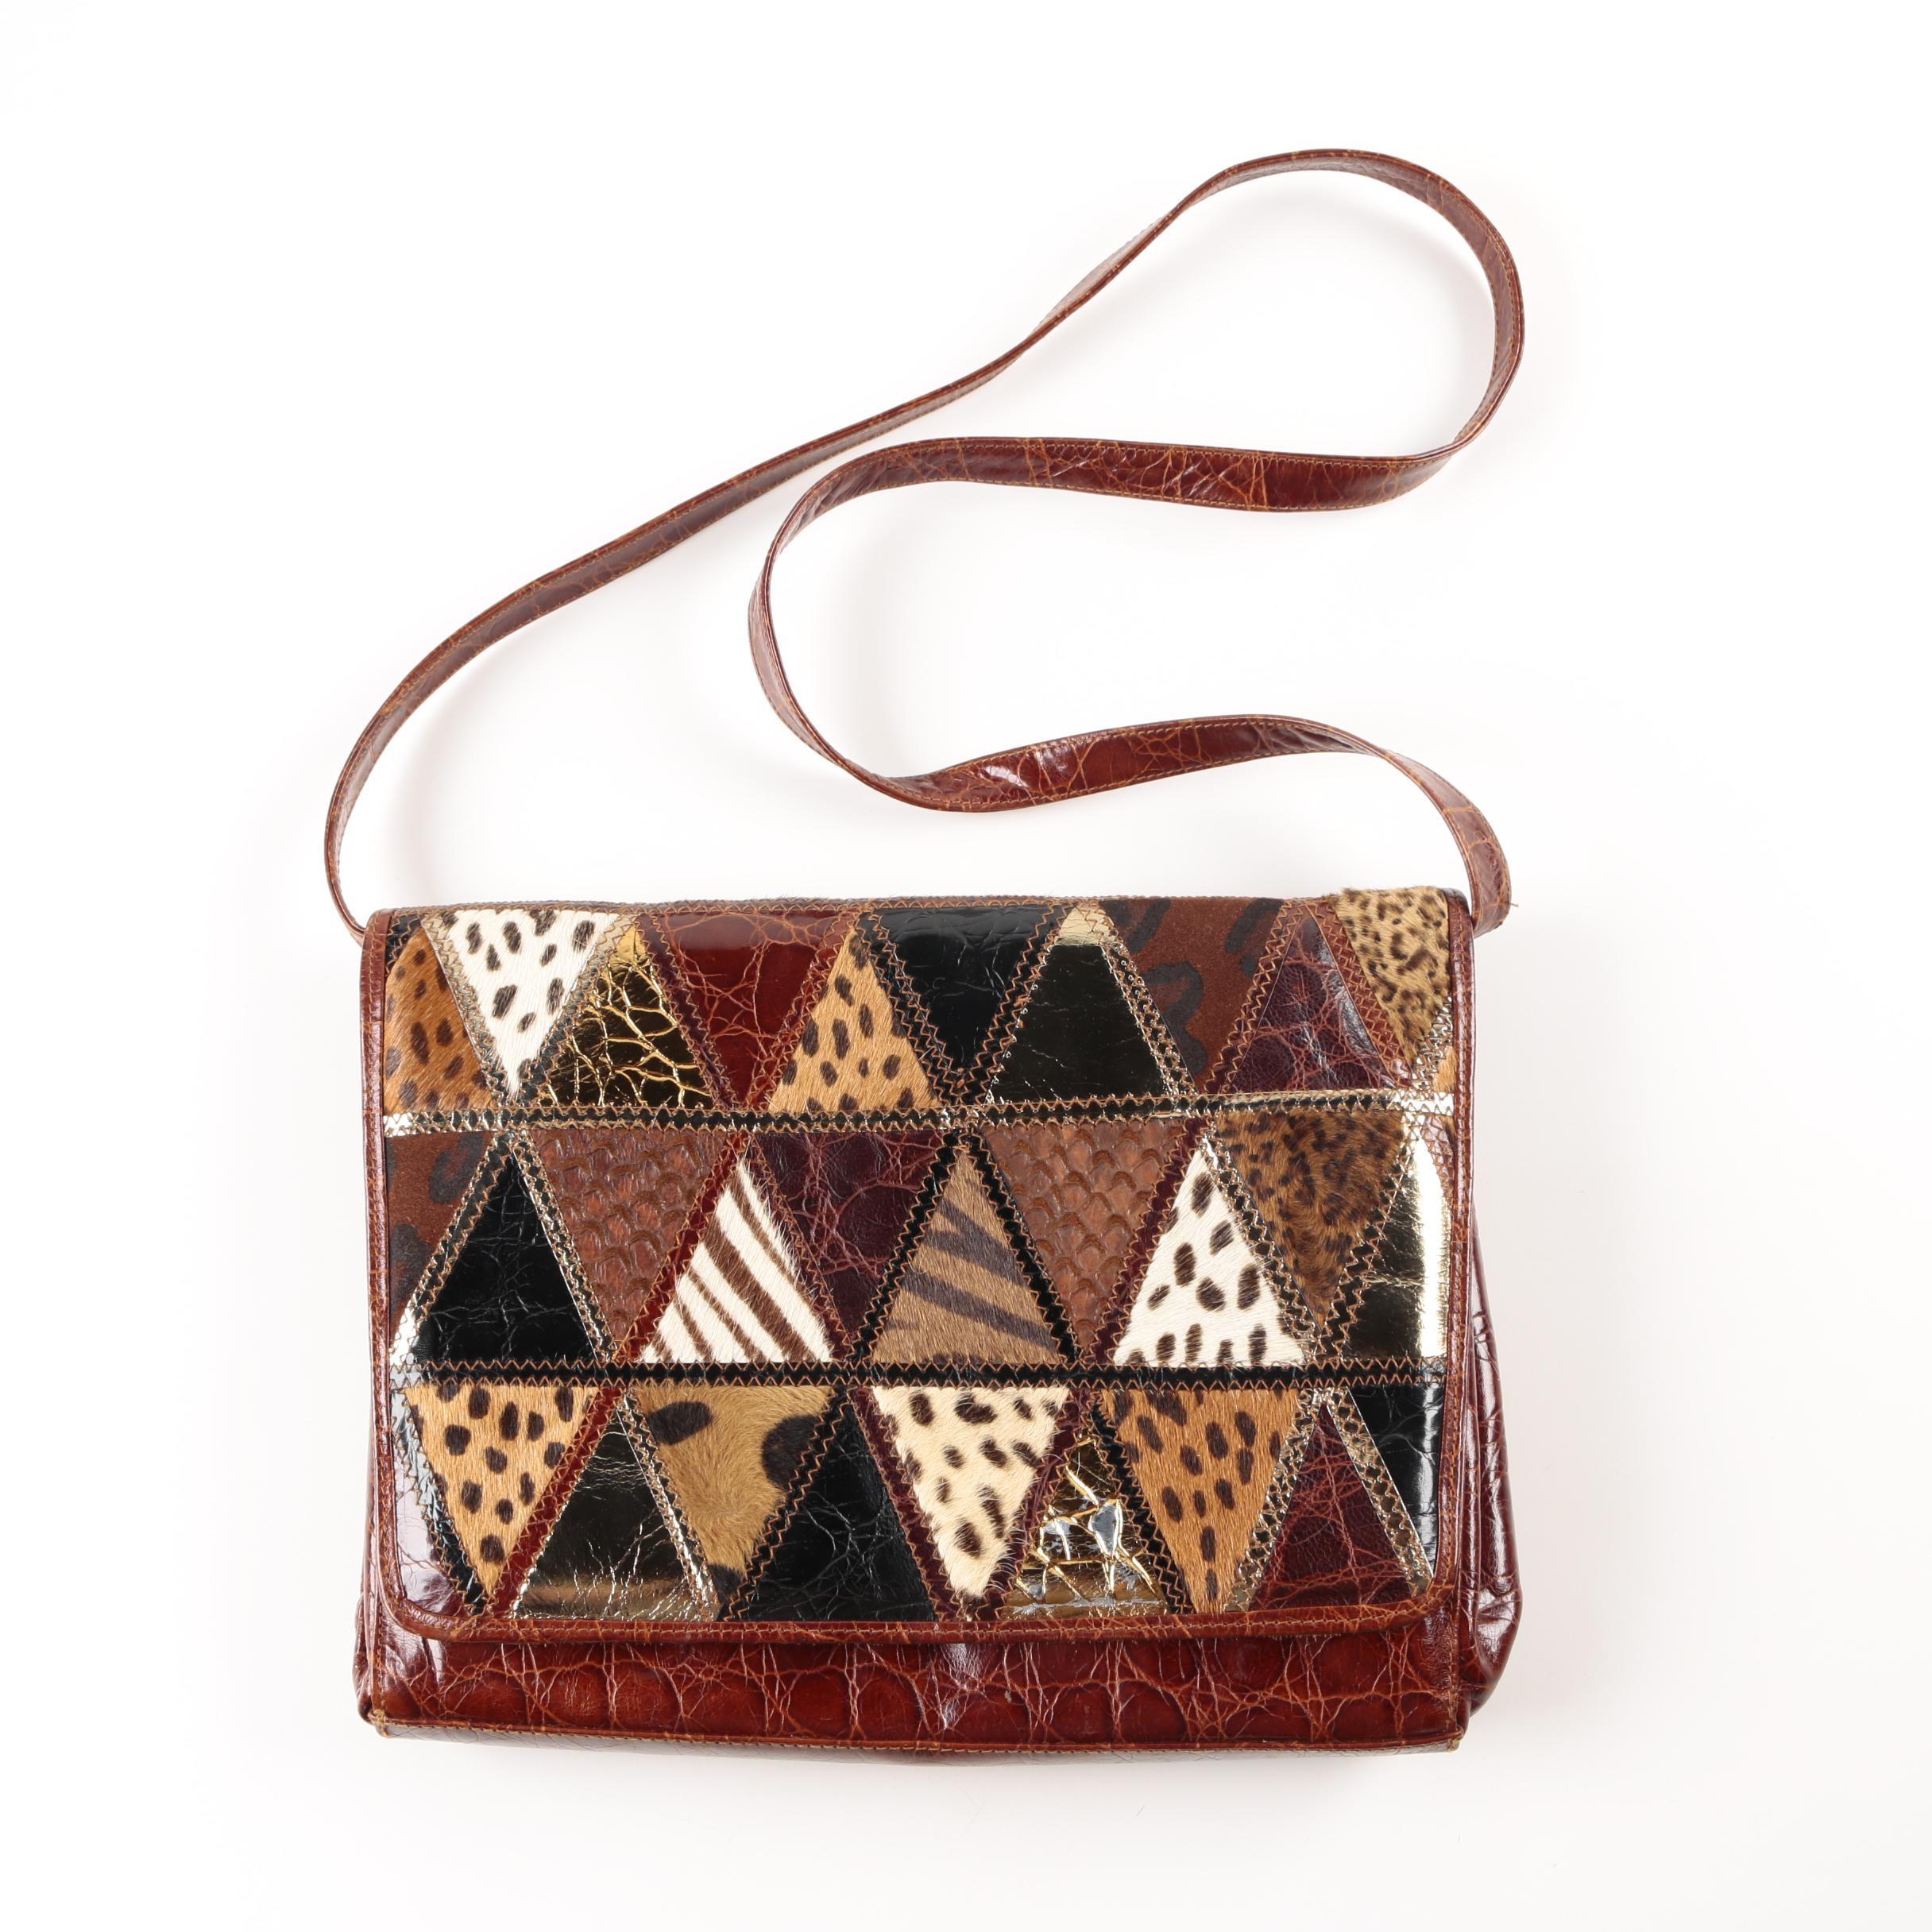 Vintage Leather Embossed and Calf Hair  Handbag